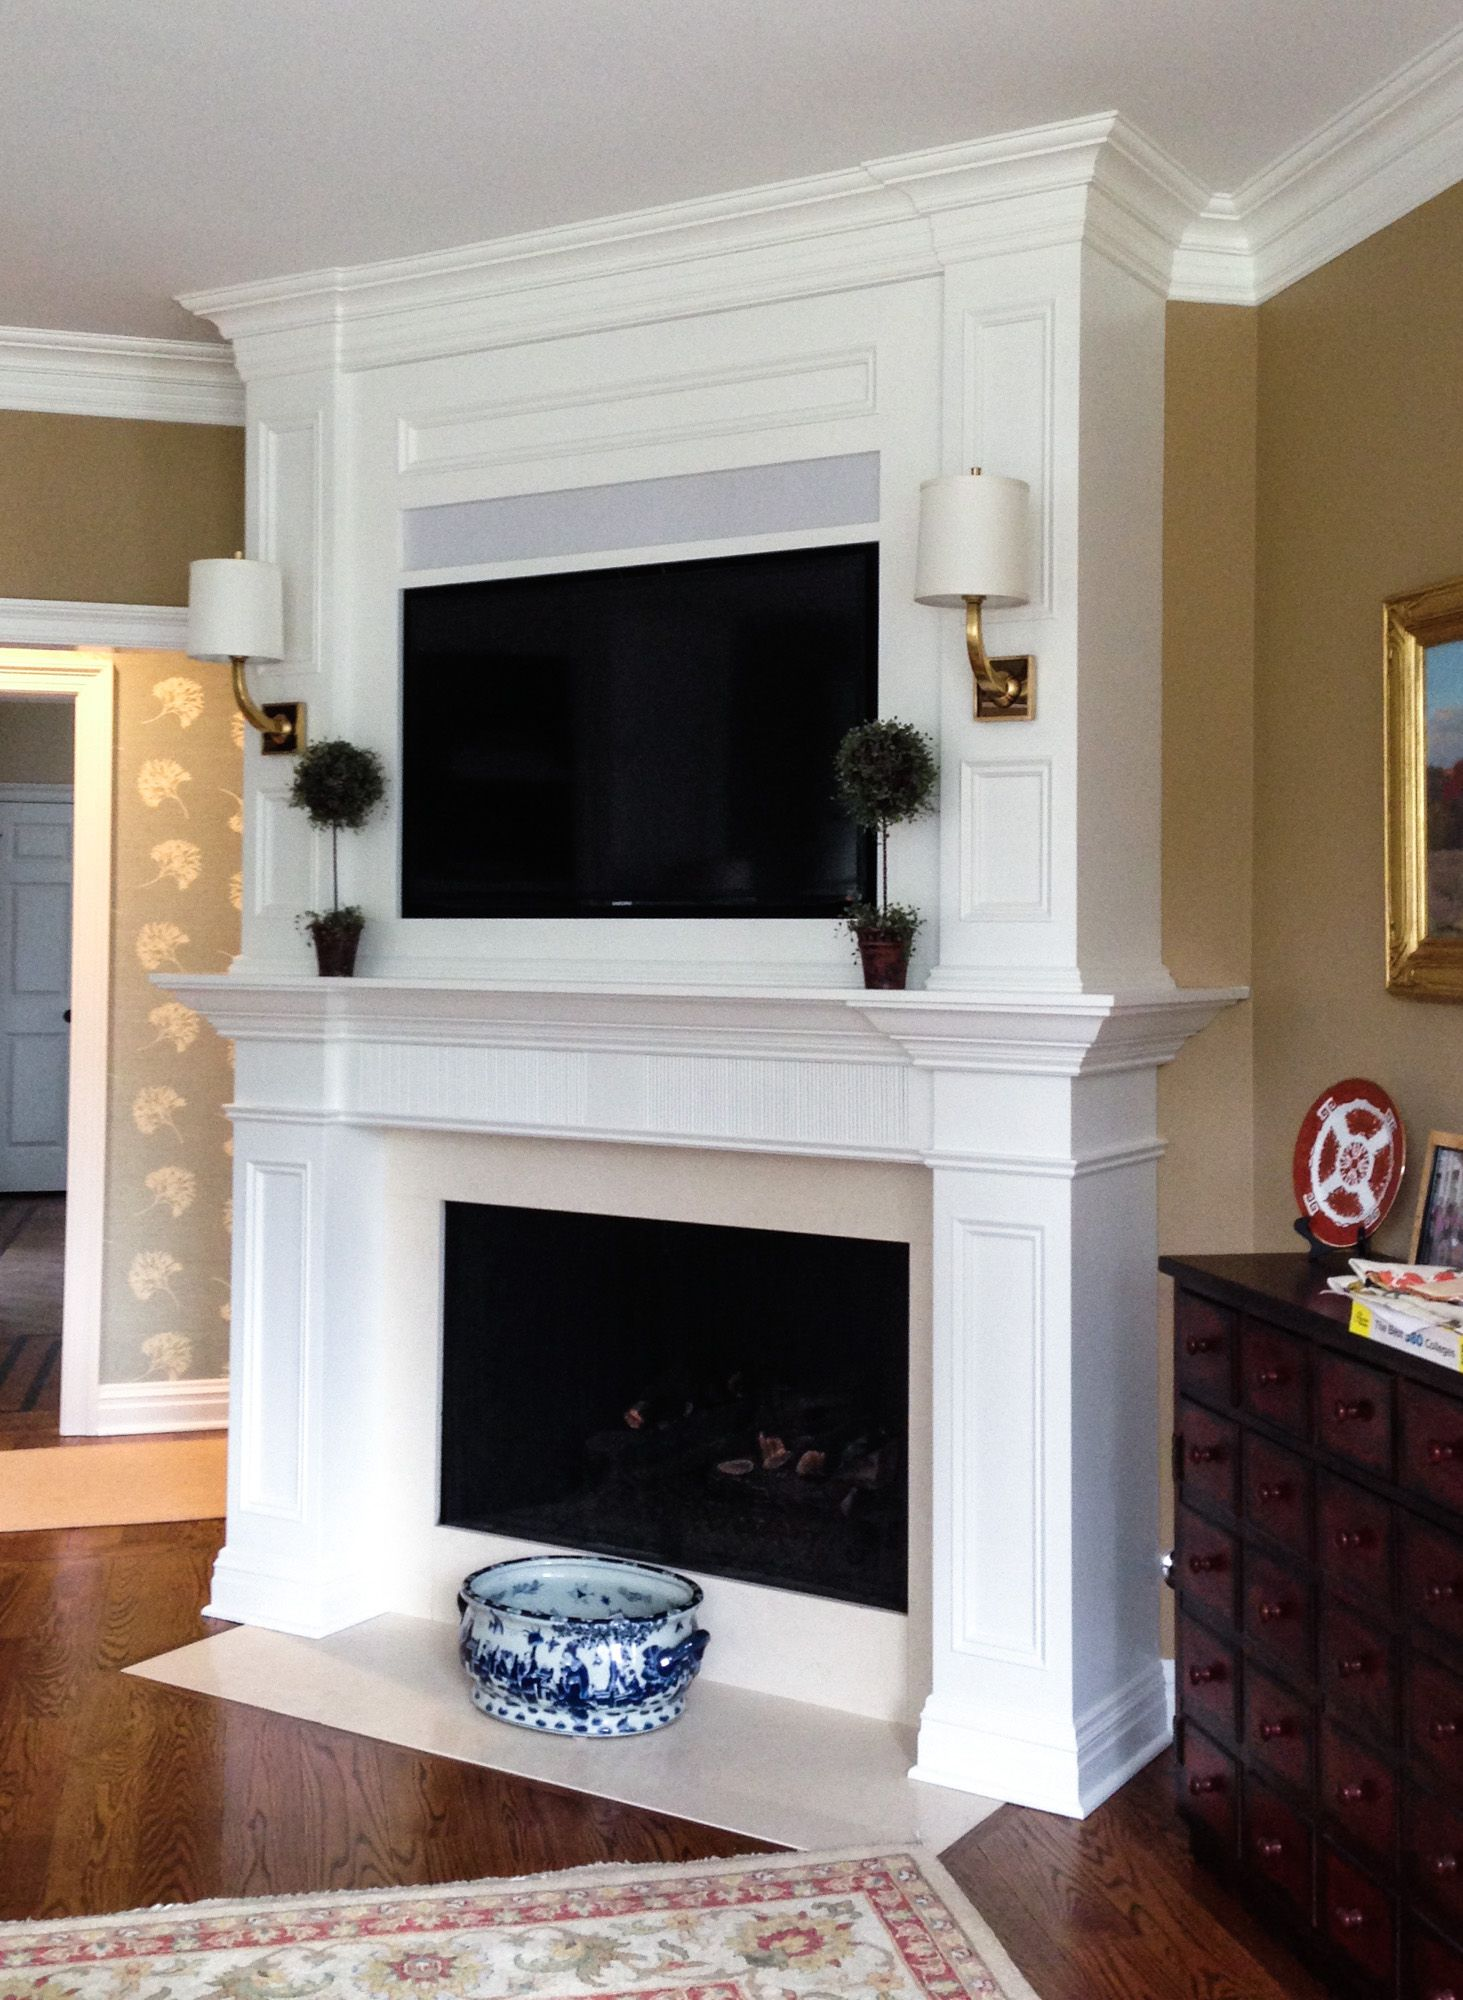 Custom builtin fireplace surround with tv lighting